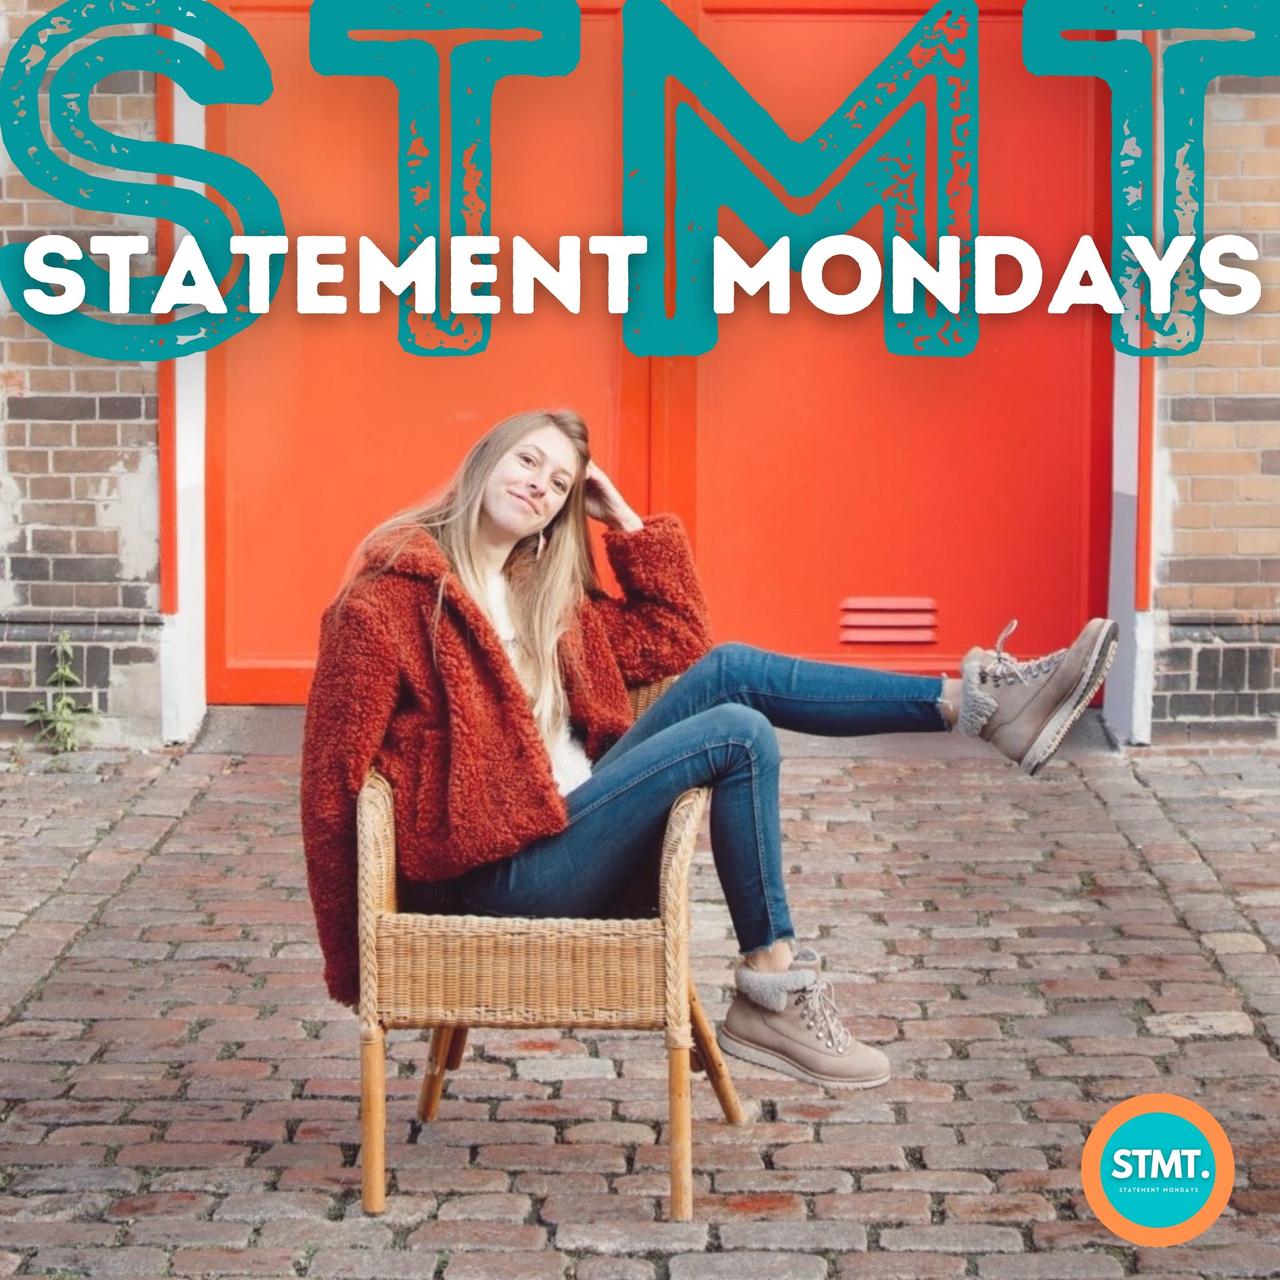 Statement Mondays: Behind the Scenes